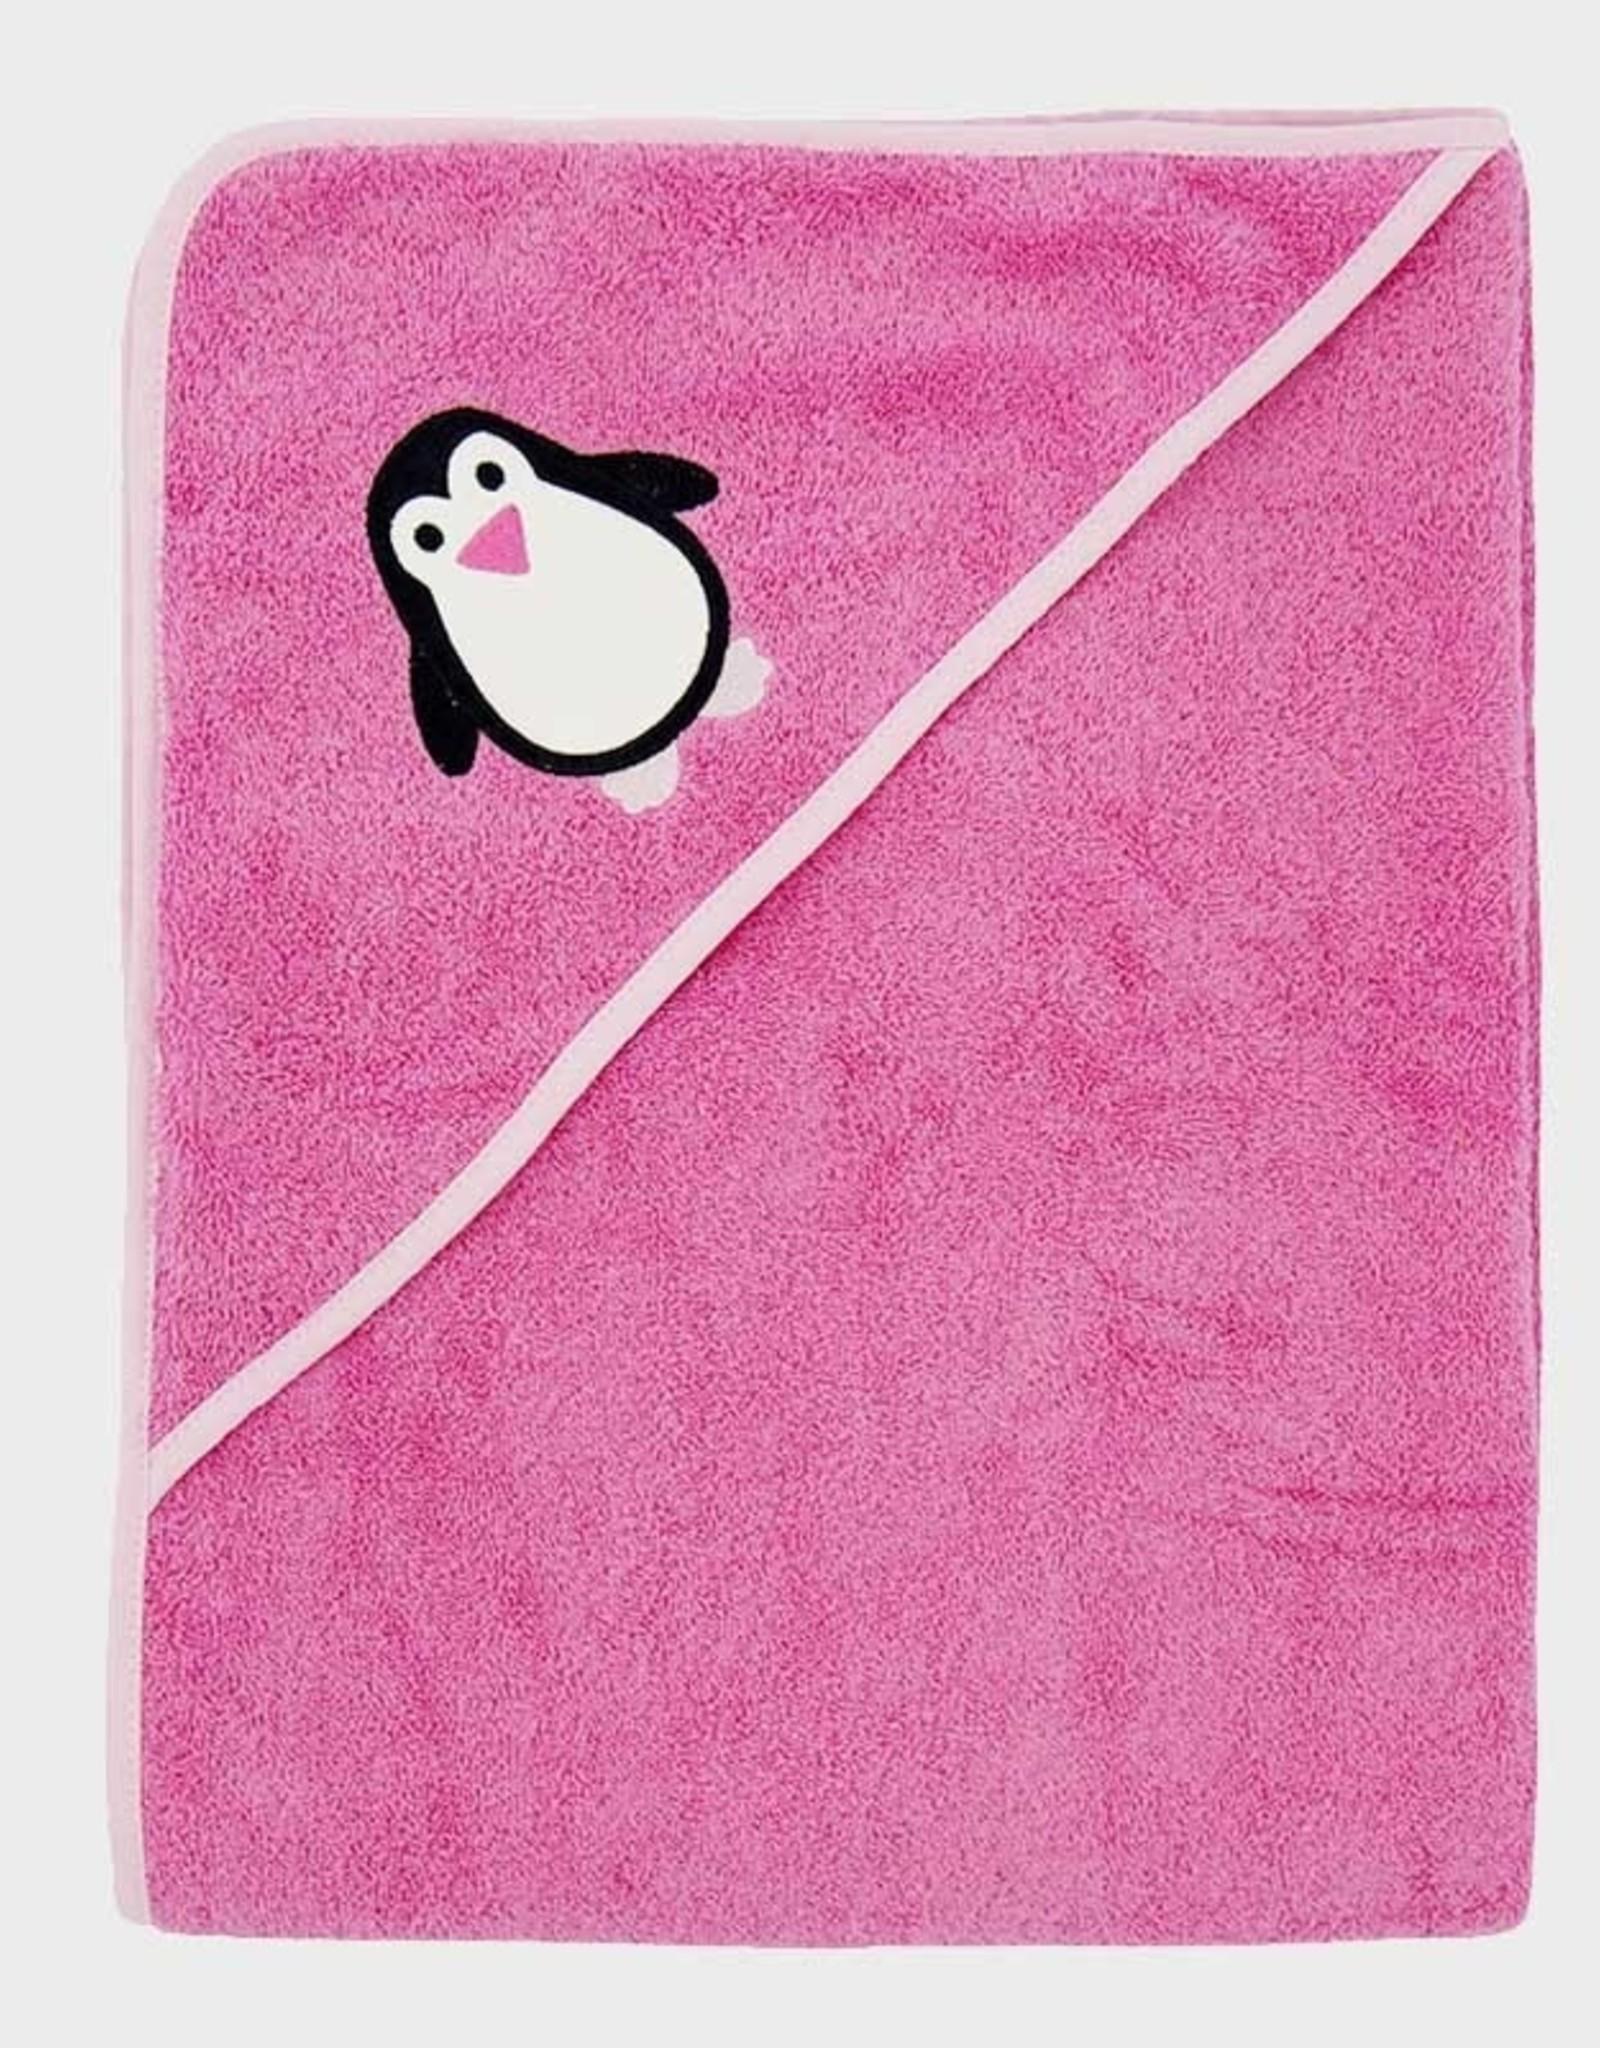 ImseVimse Hooded Towel - Pink Penguin 100 x 100cm